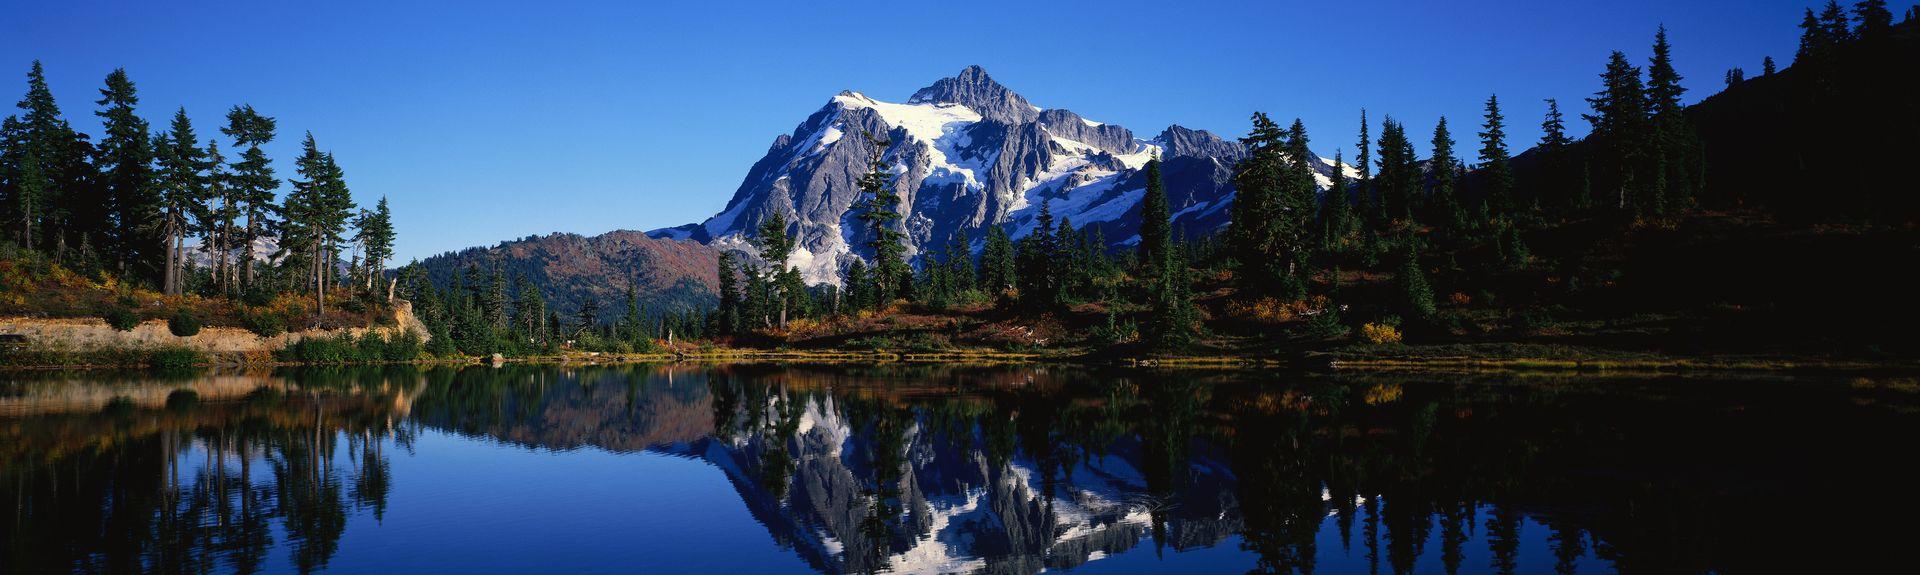 Cascade Range, United States of America